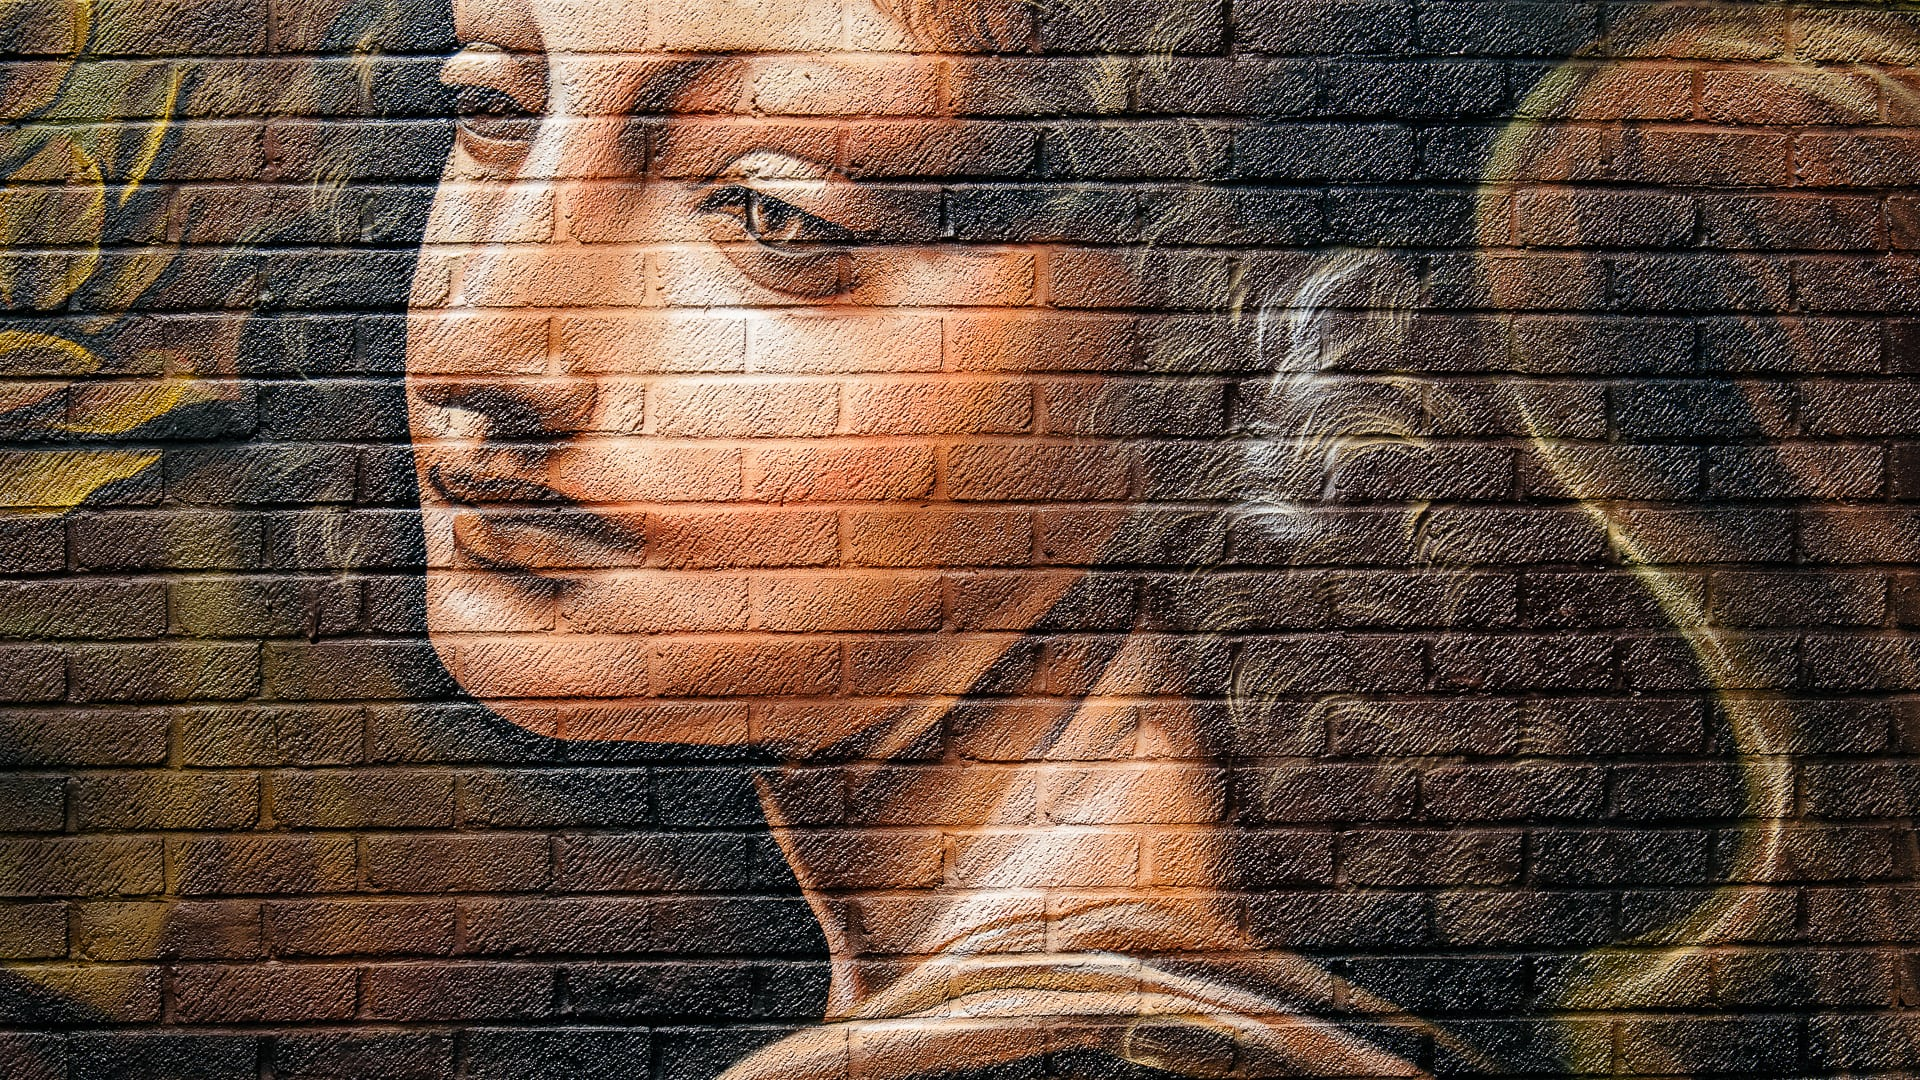 Graffiti Ippodromo San Siro Leonardo Da Vinci